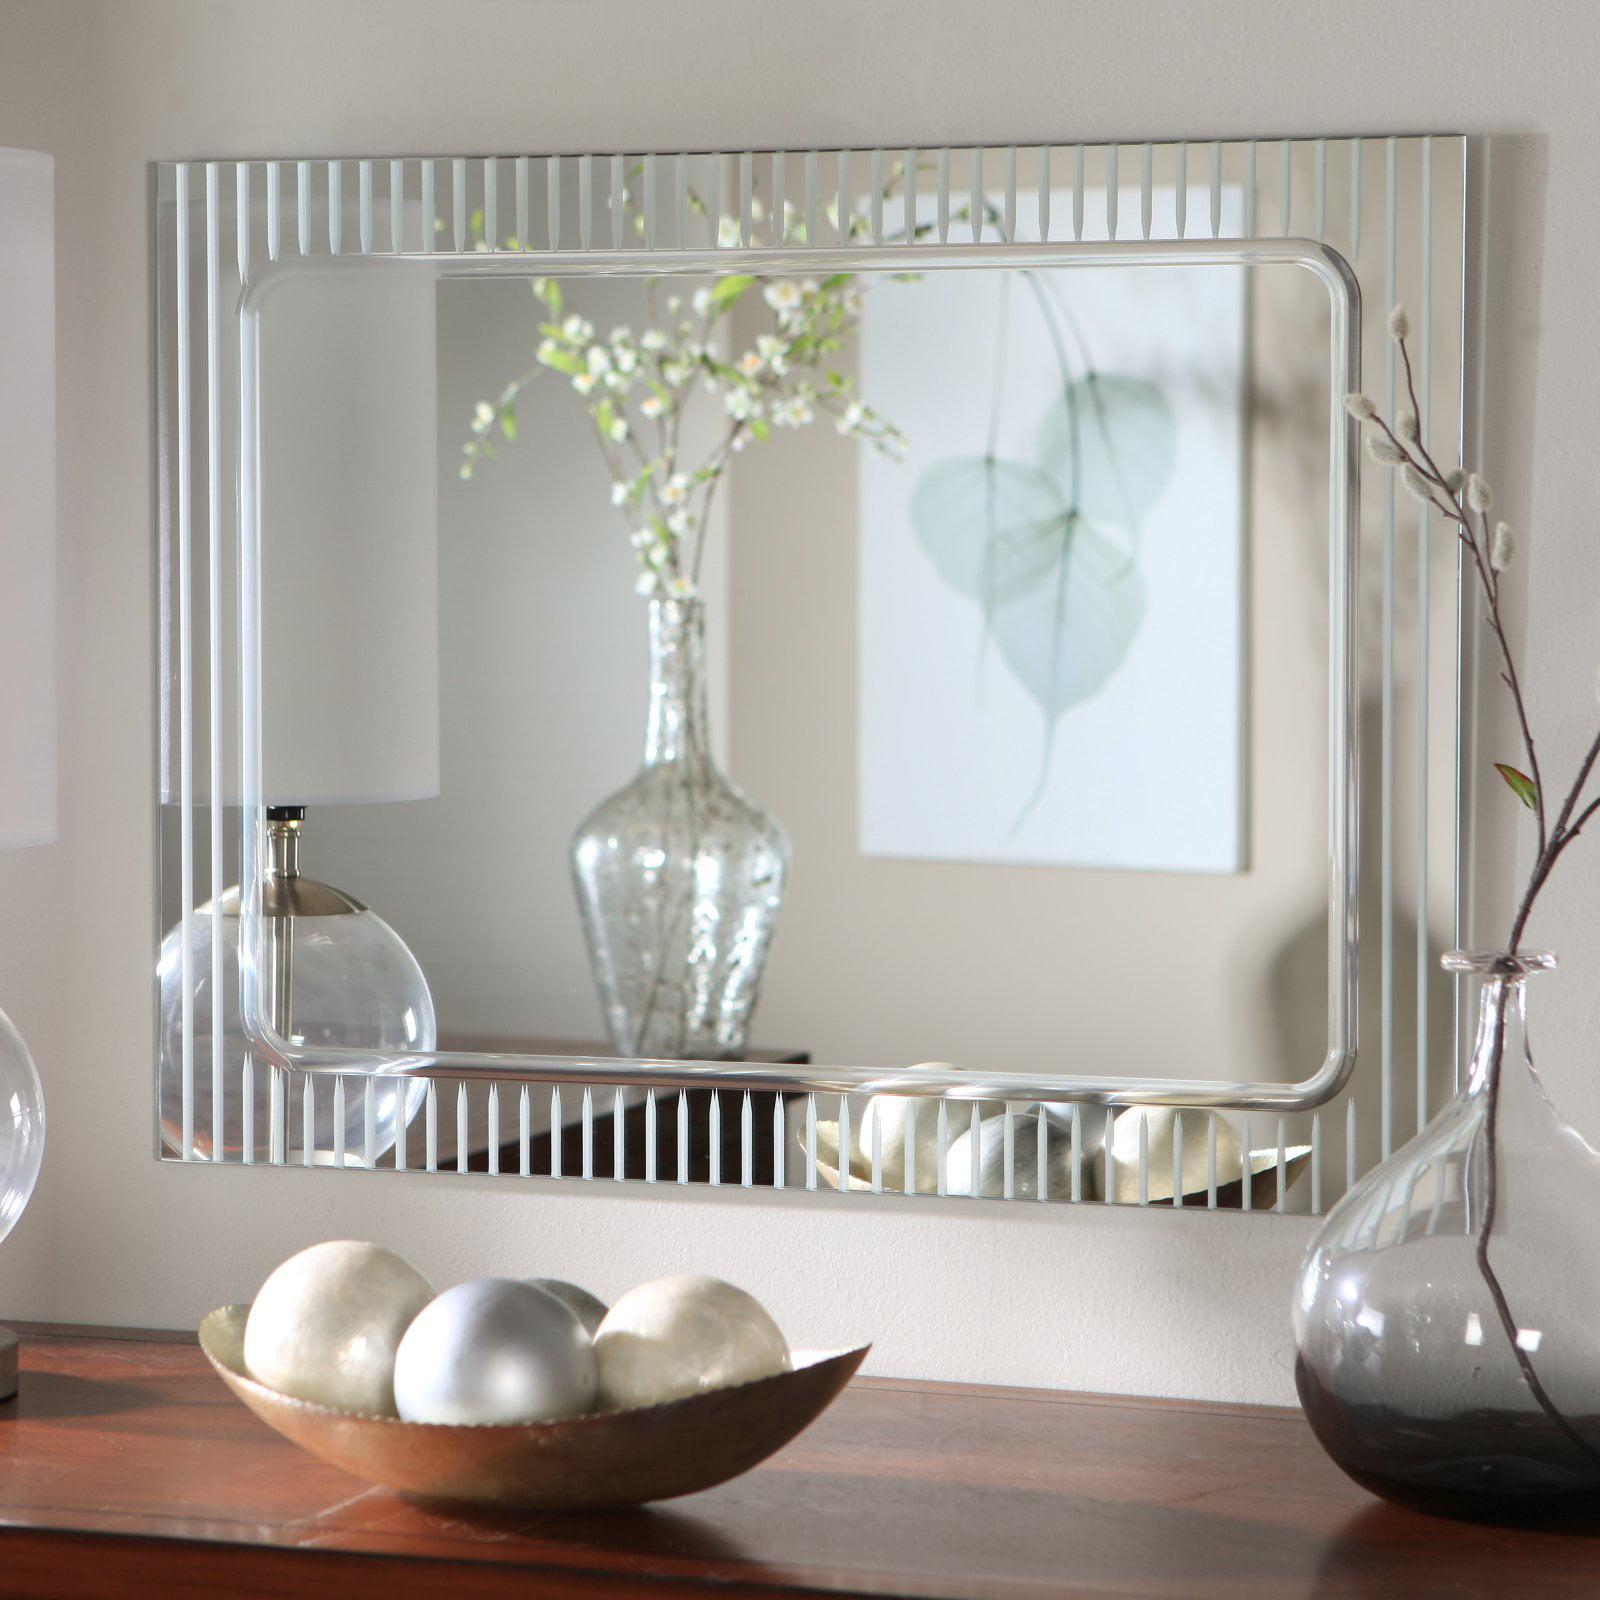 Décor Wonderland Frameless Deco Wall Mirror - 23.5W x 31.5H in.